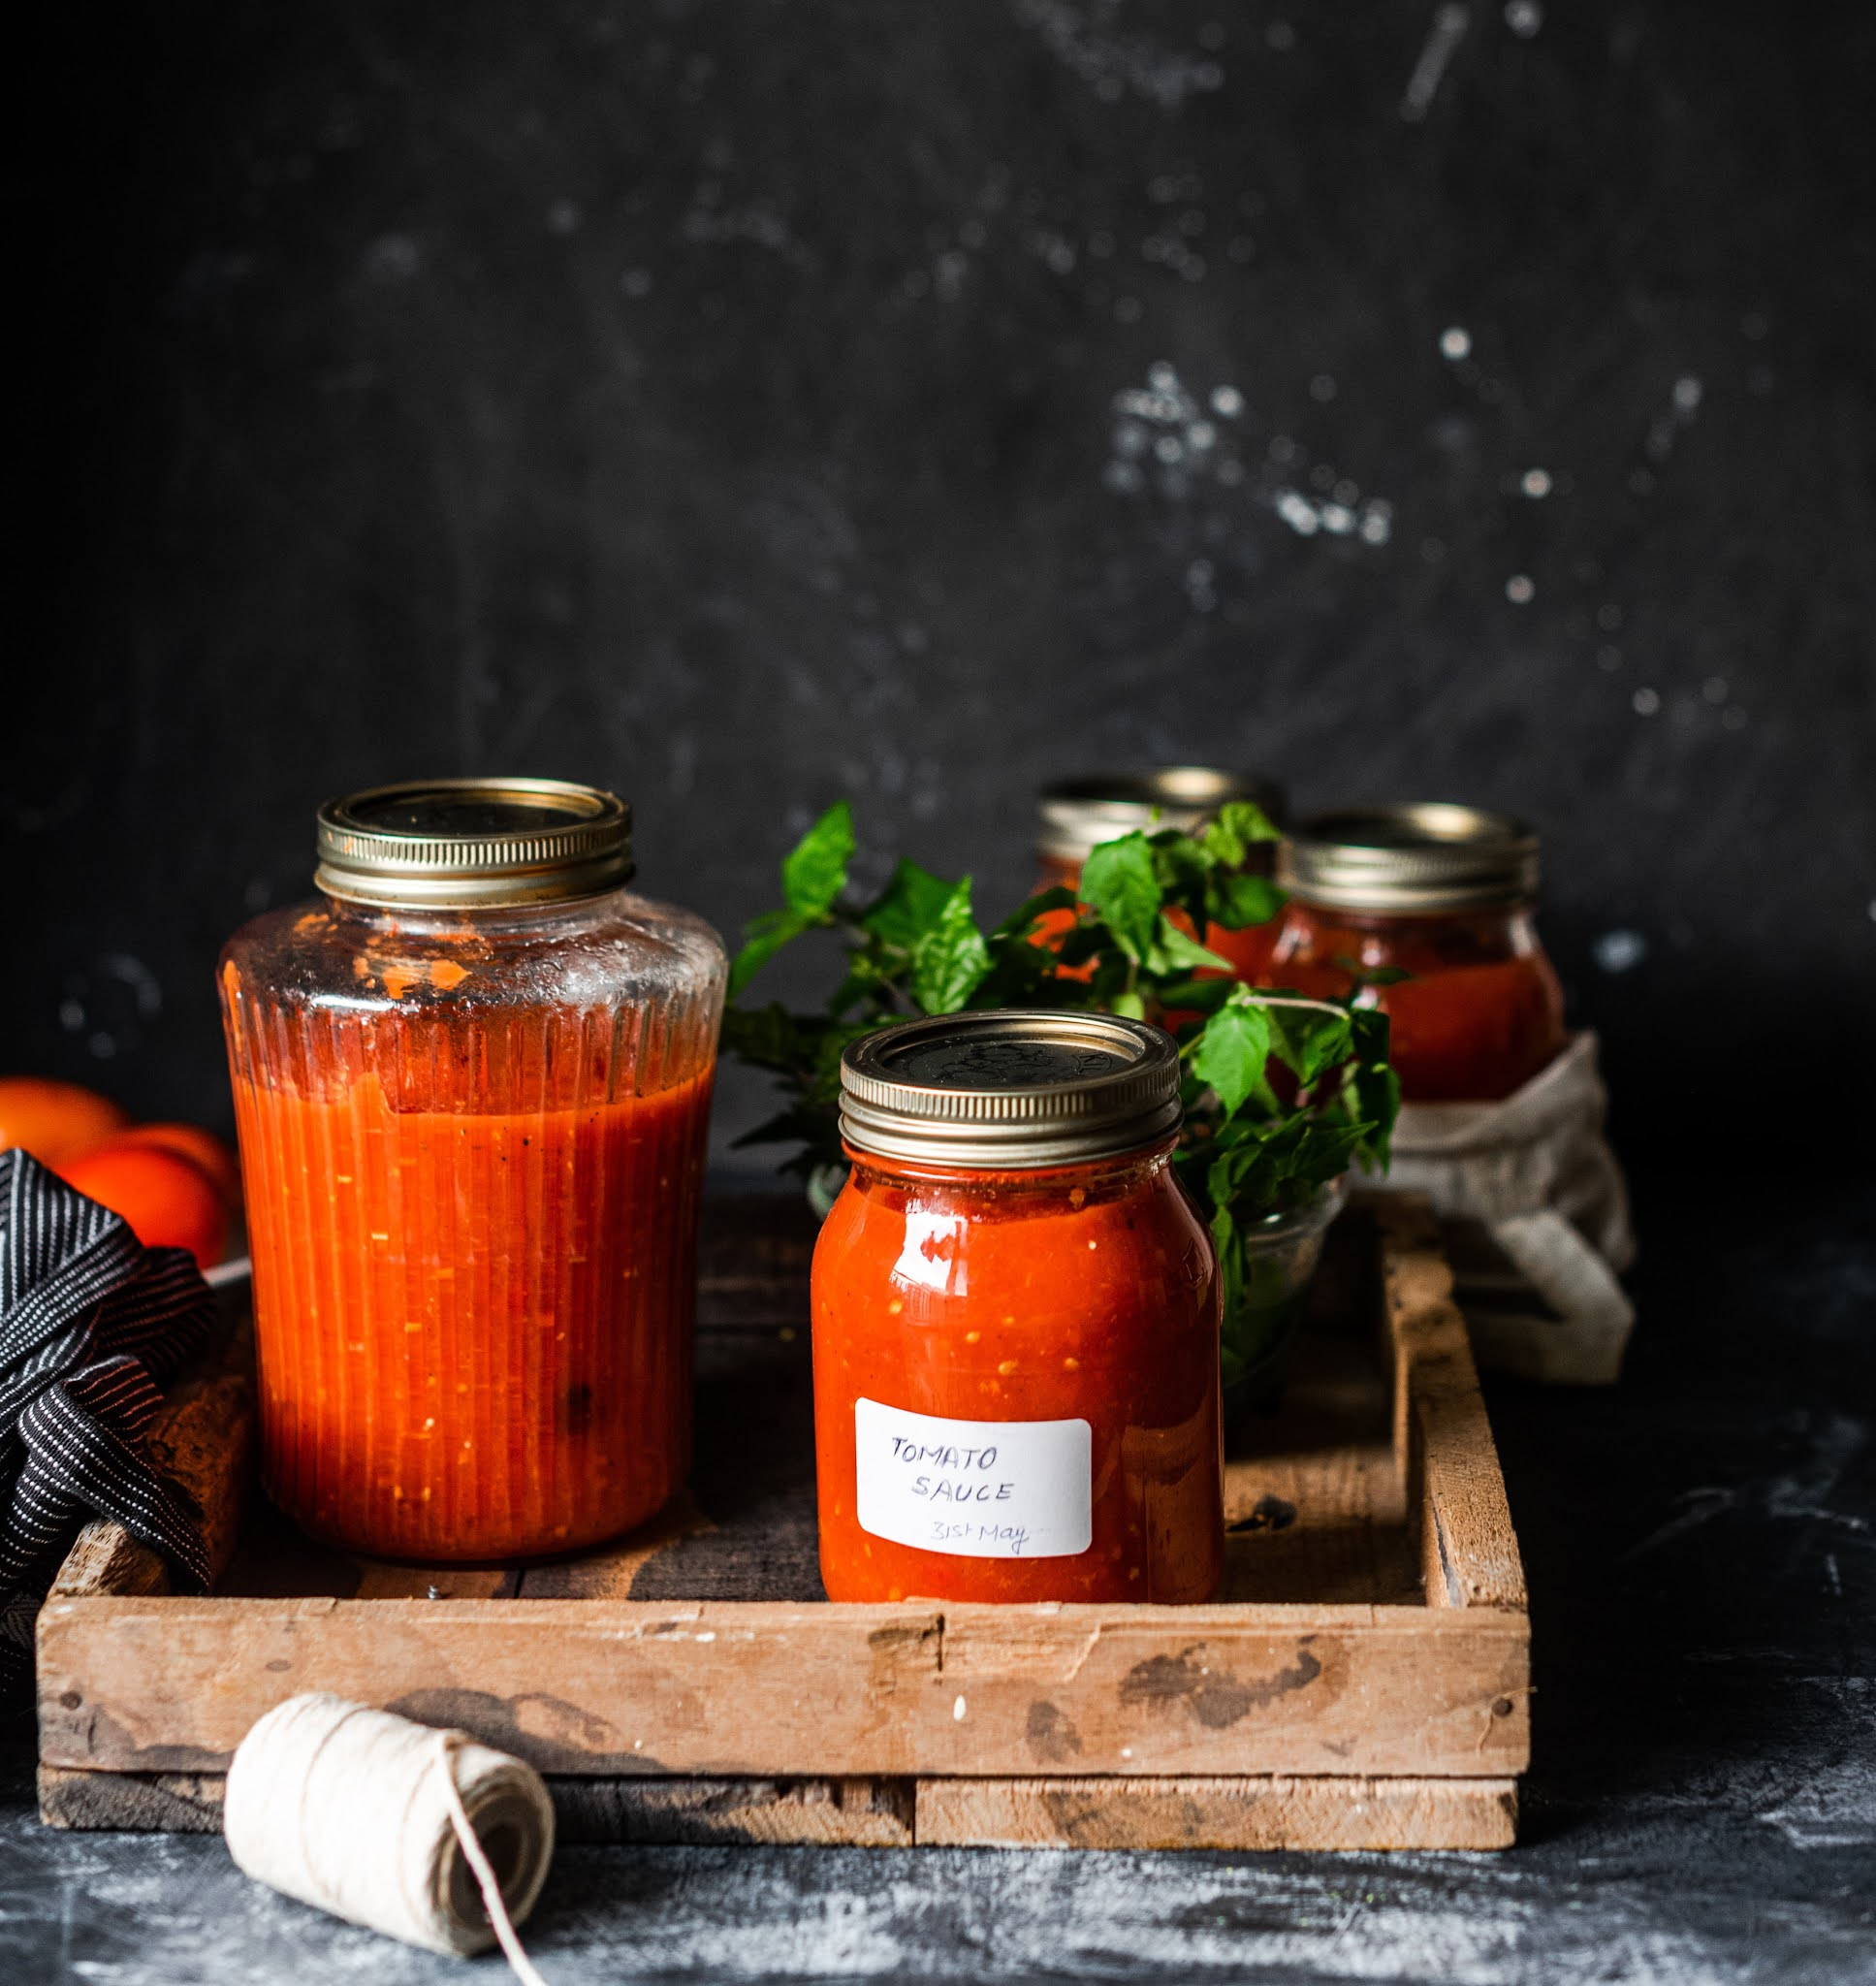 Canning tomato sauce